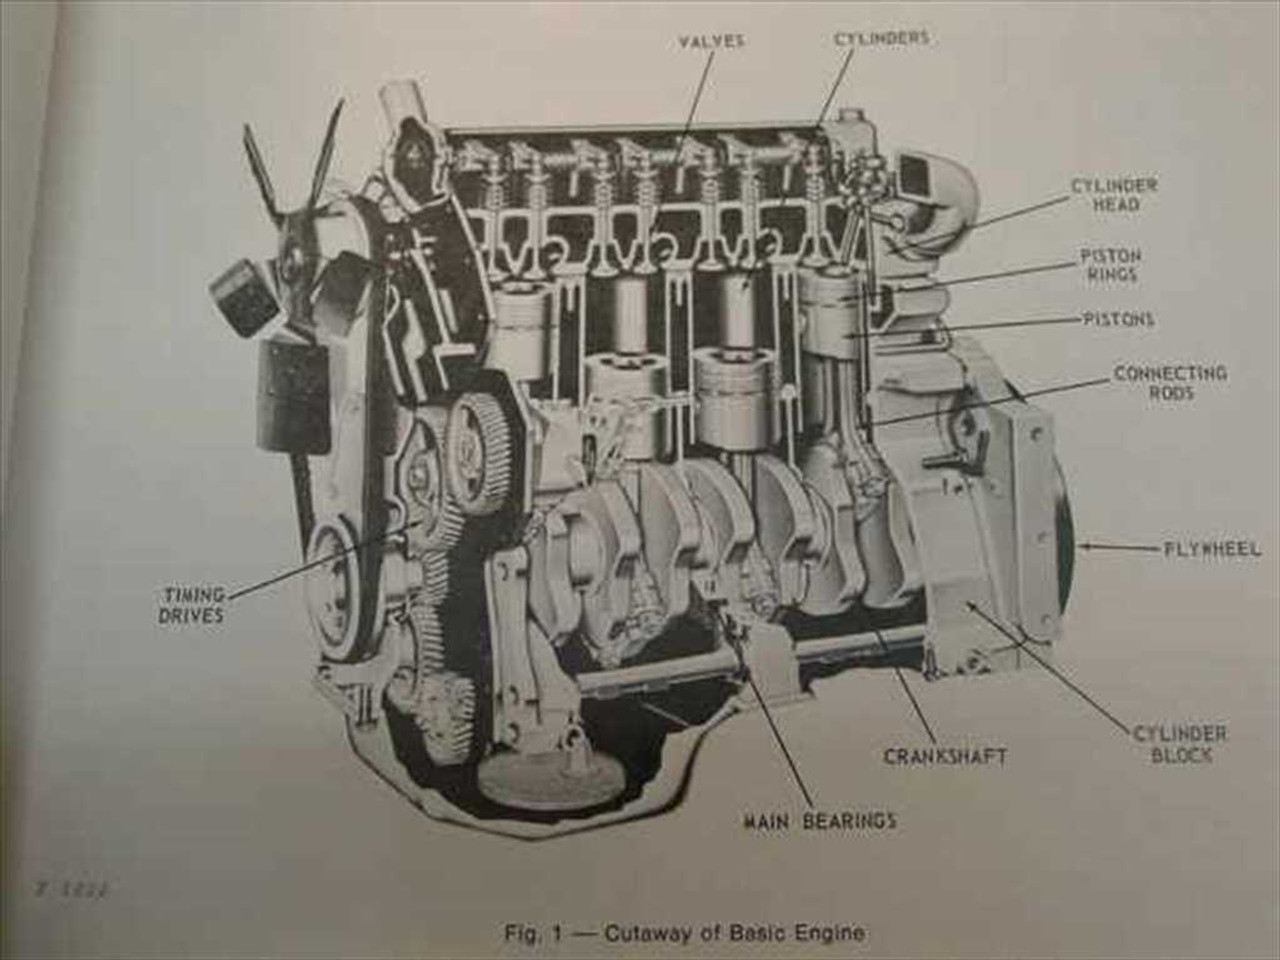 John Deere Engines Fundamentals of Service - Engines